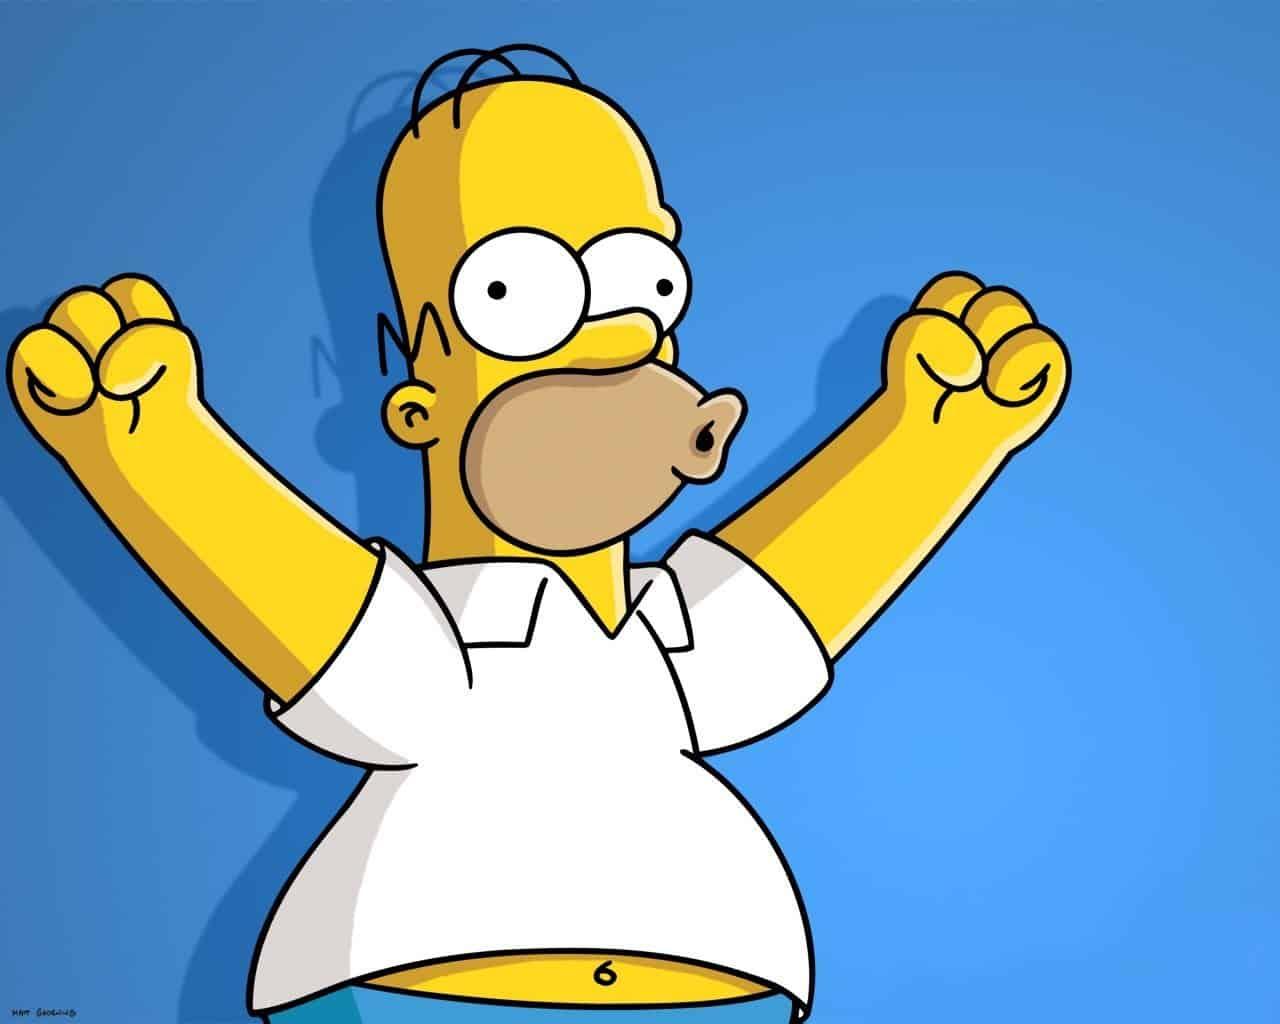 Homero Jay Simpson / Matt Groening